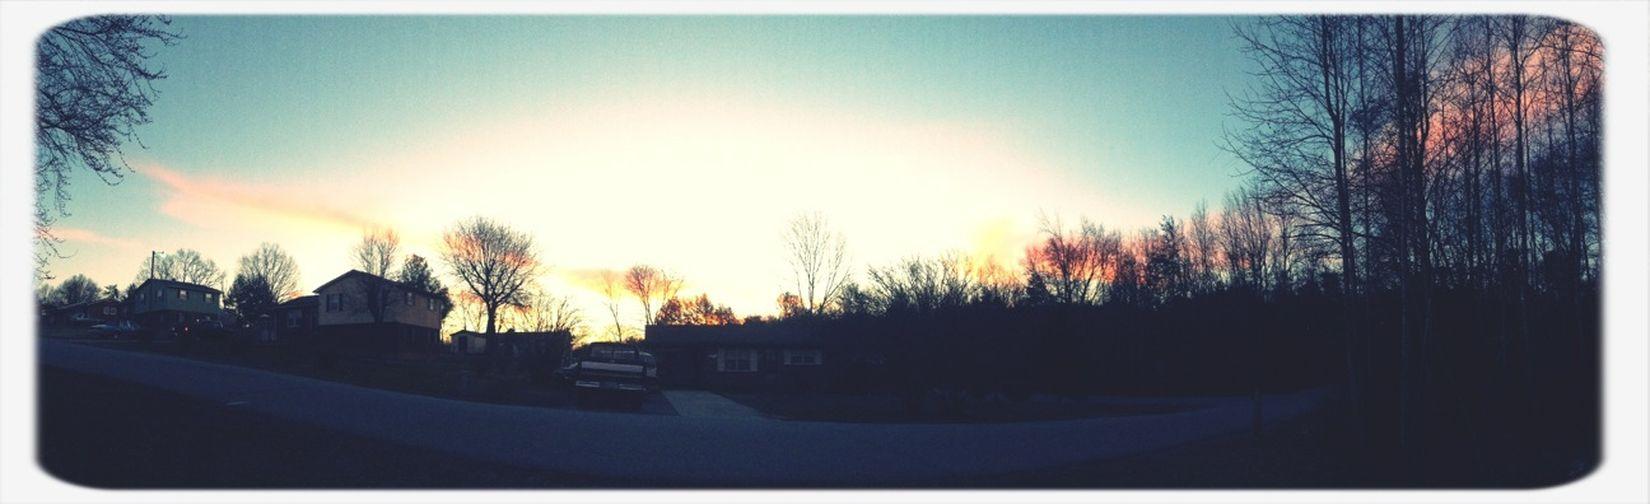 My Panorama:)